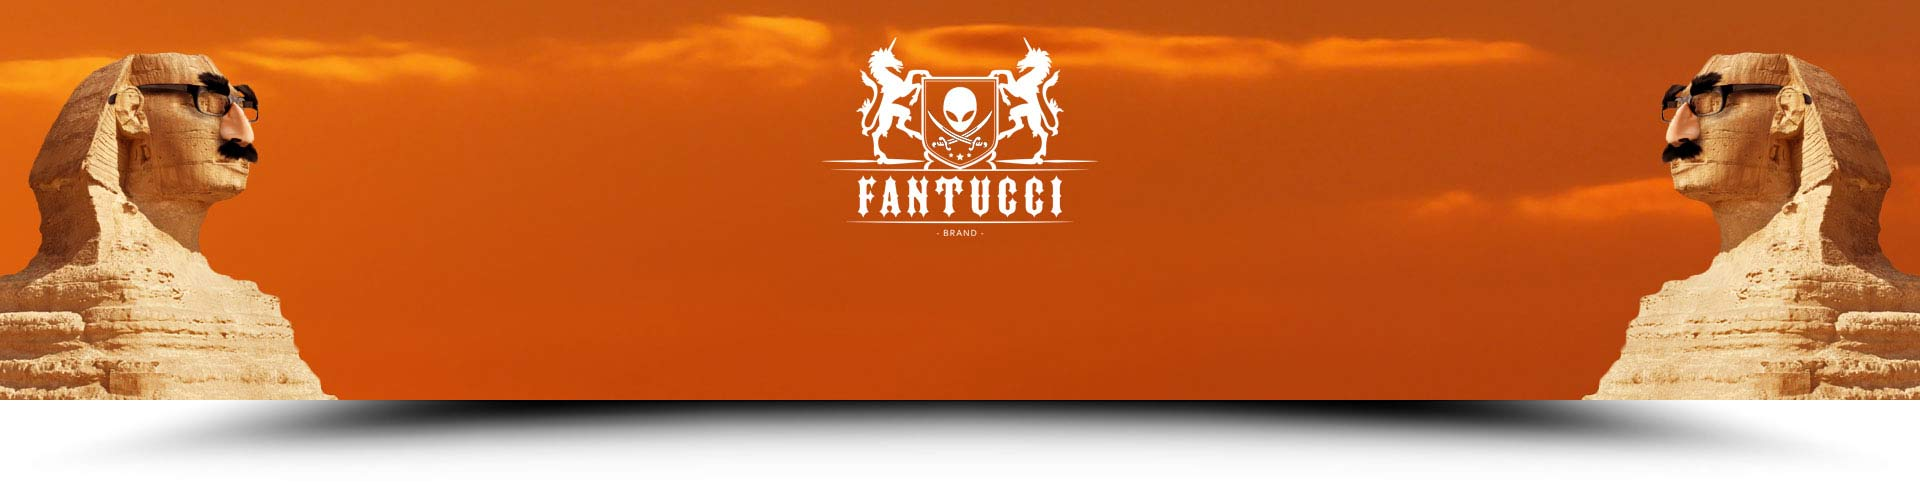 Fantucci Brand Slider 3